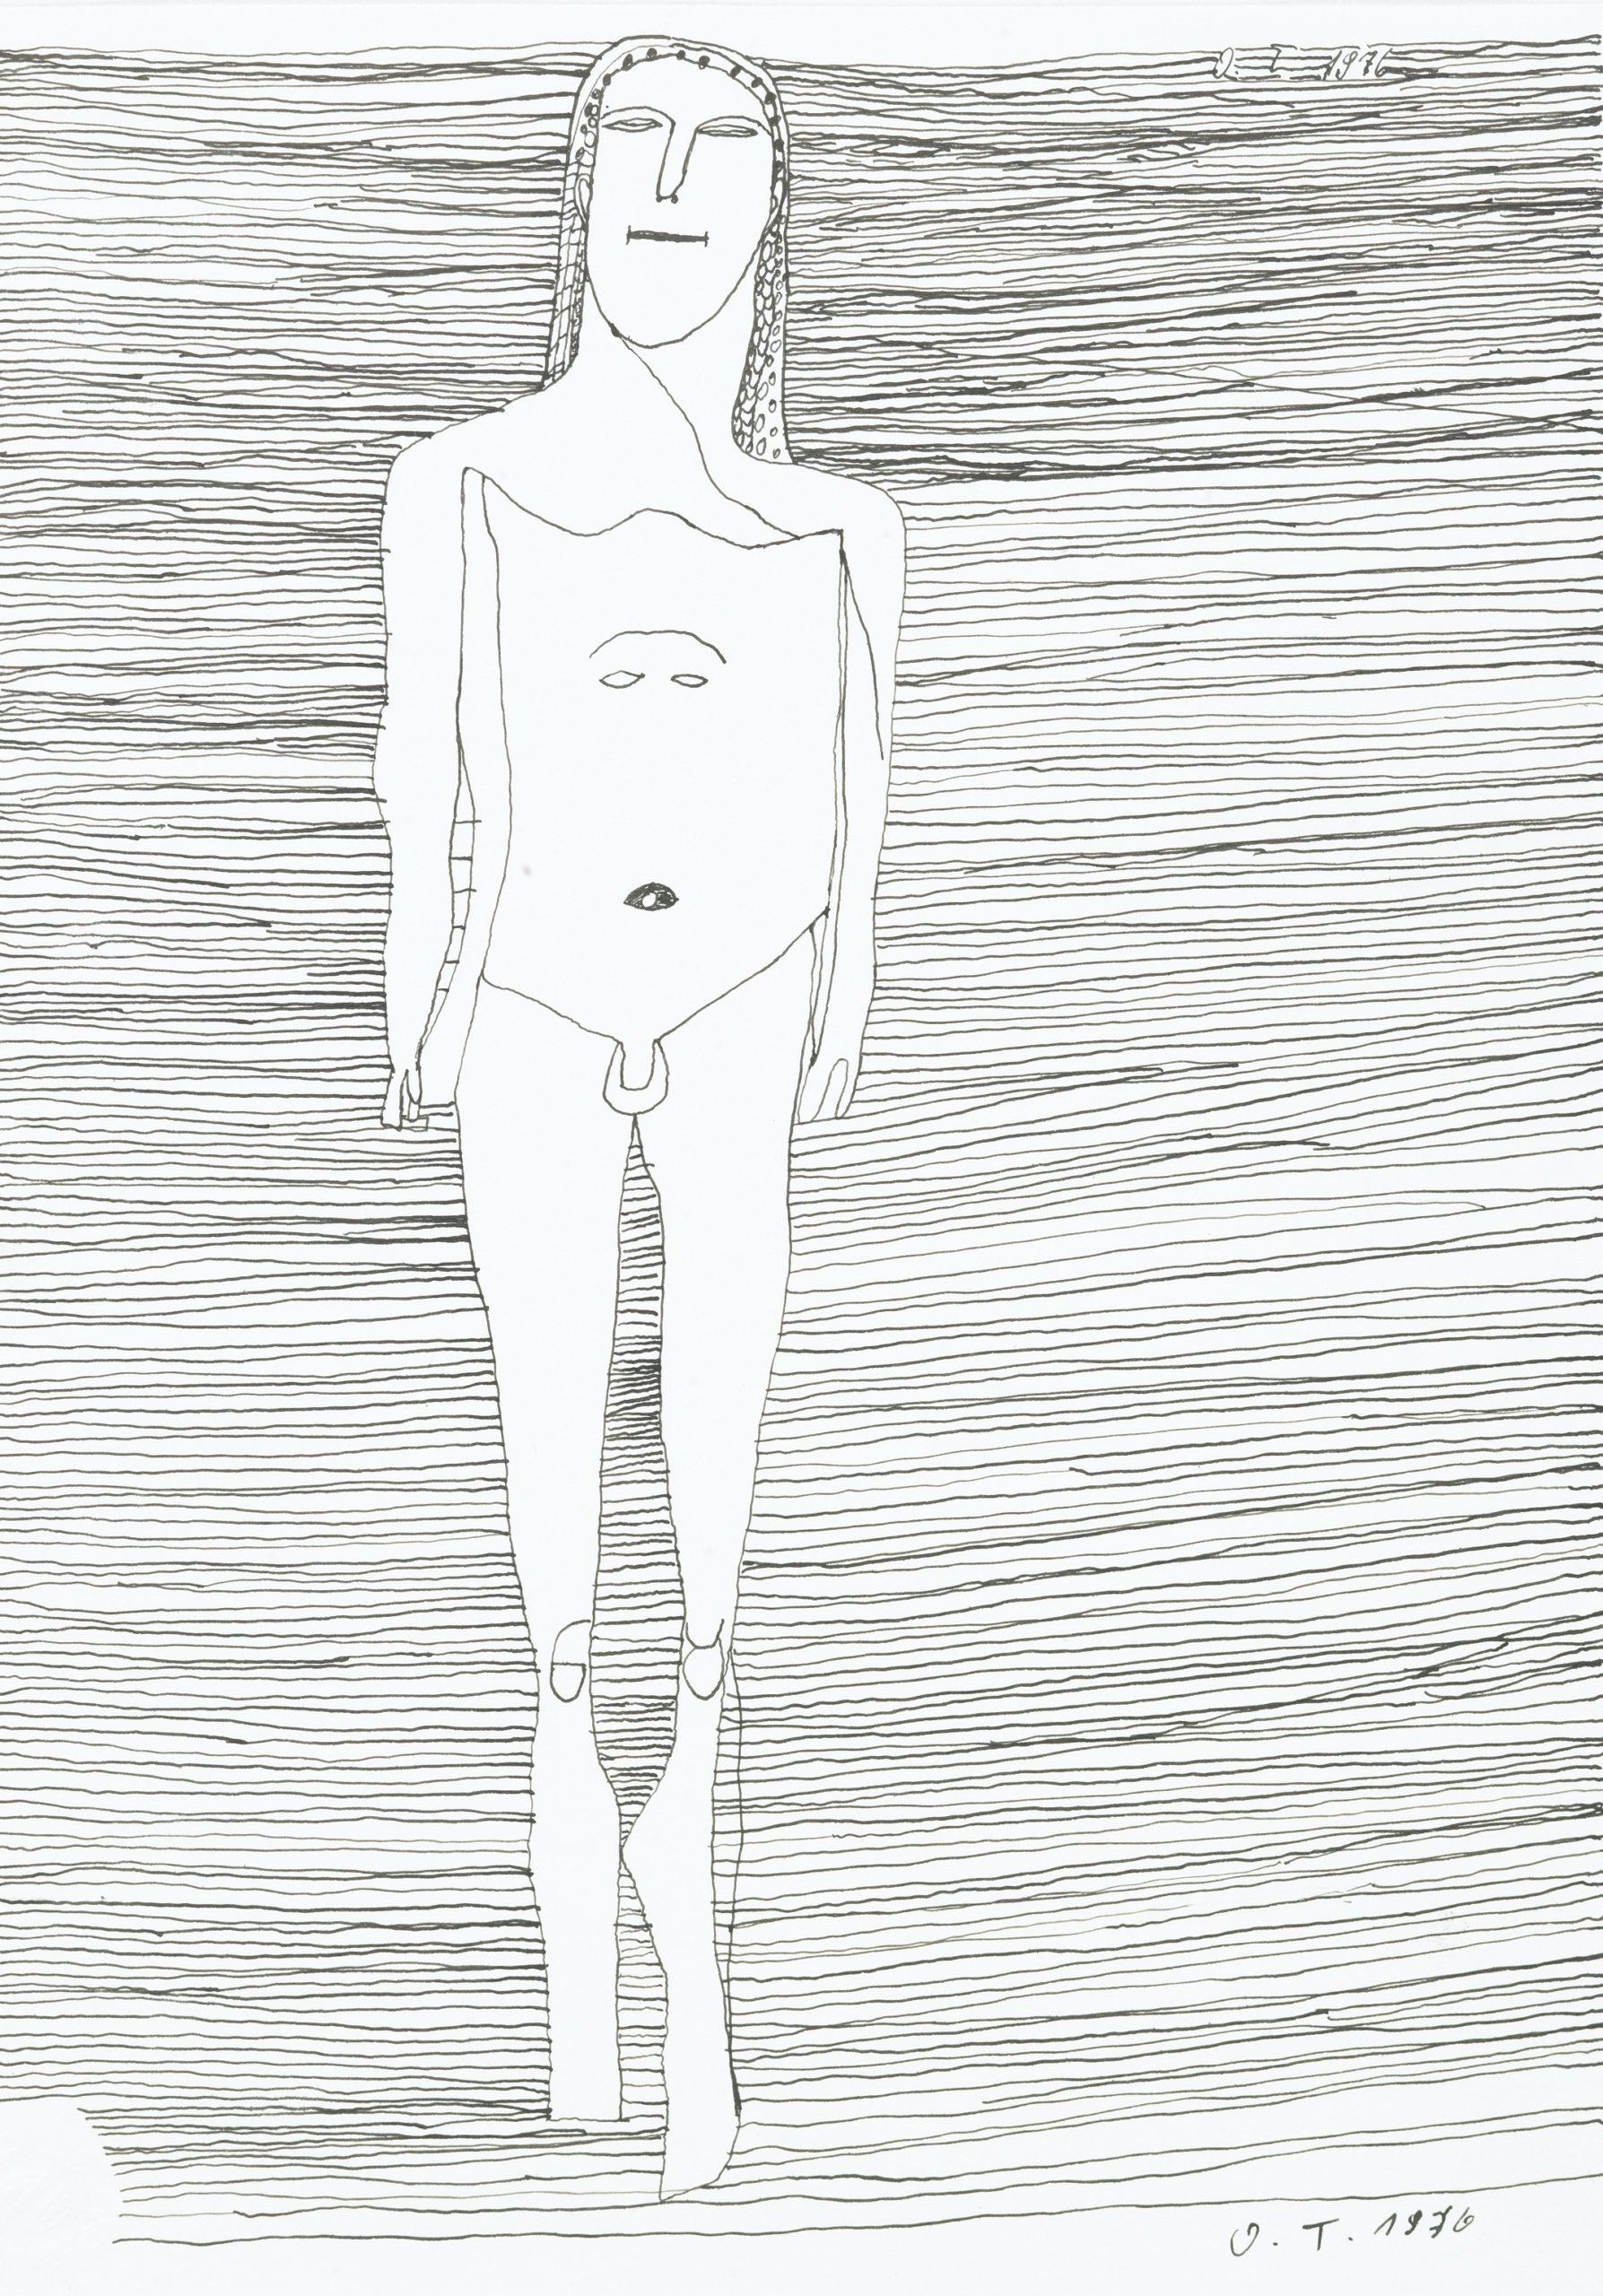 tschirtner oswald - Akt/Nude